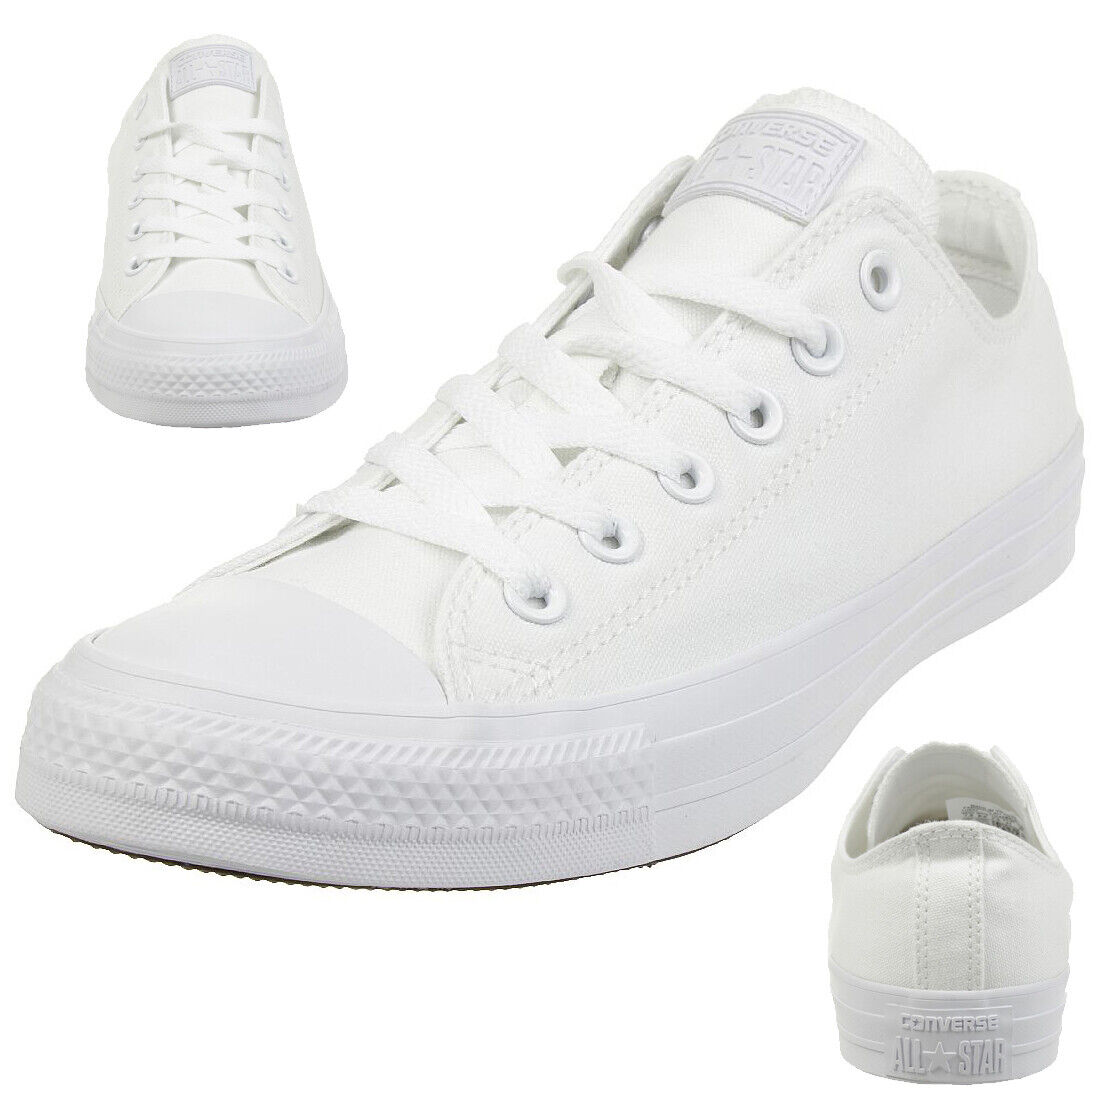 Converse all Star Ox Chuck Shoes Trainers Canvas White Monochrome 1U647